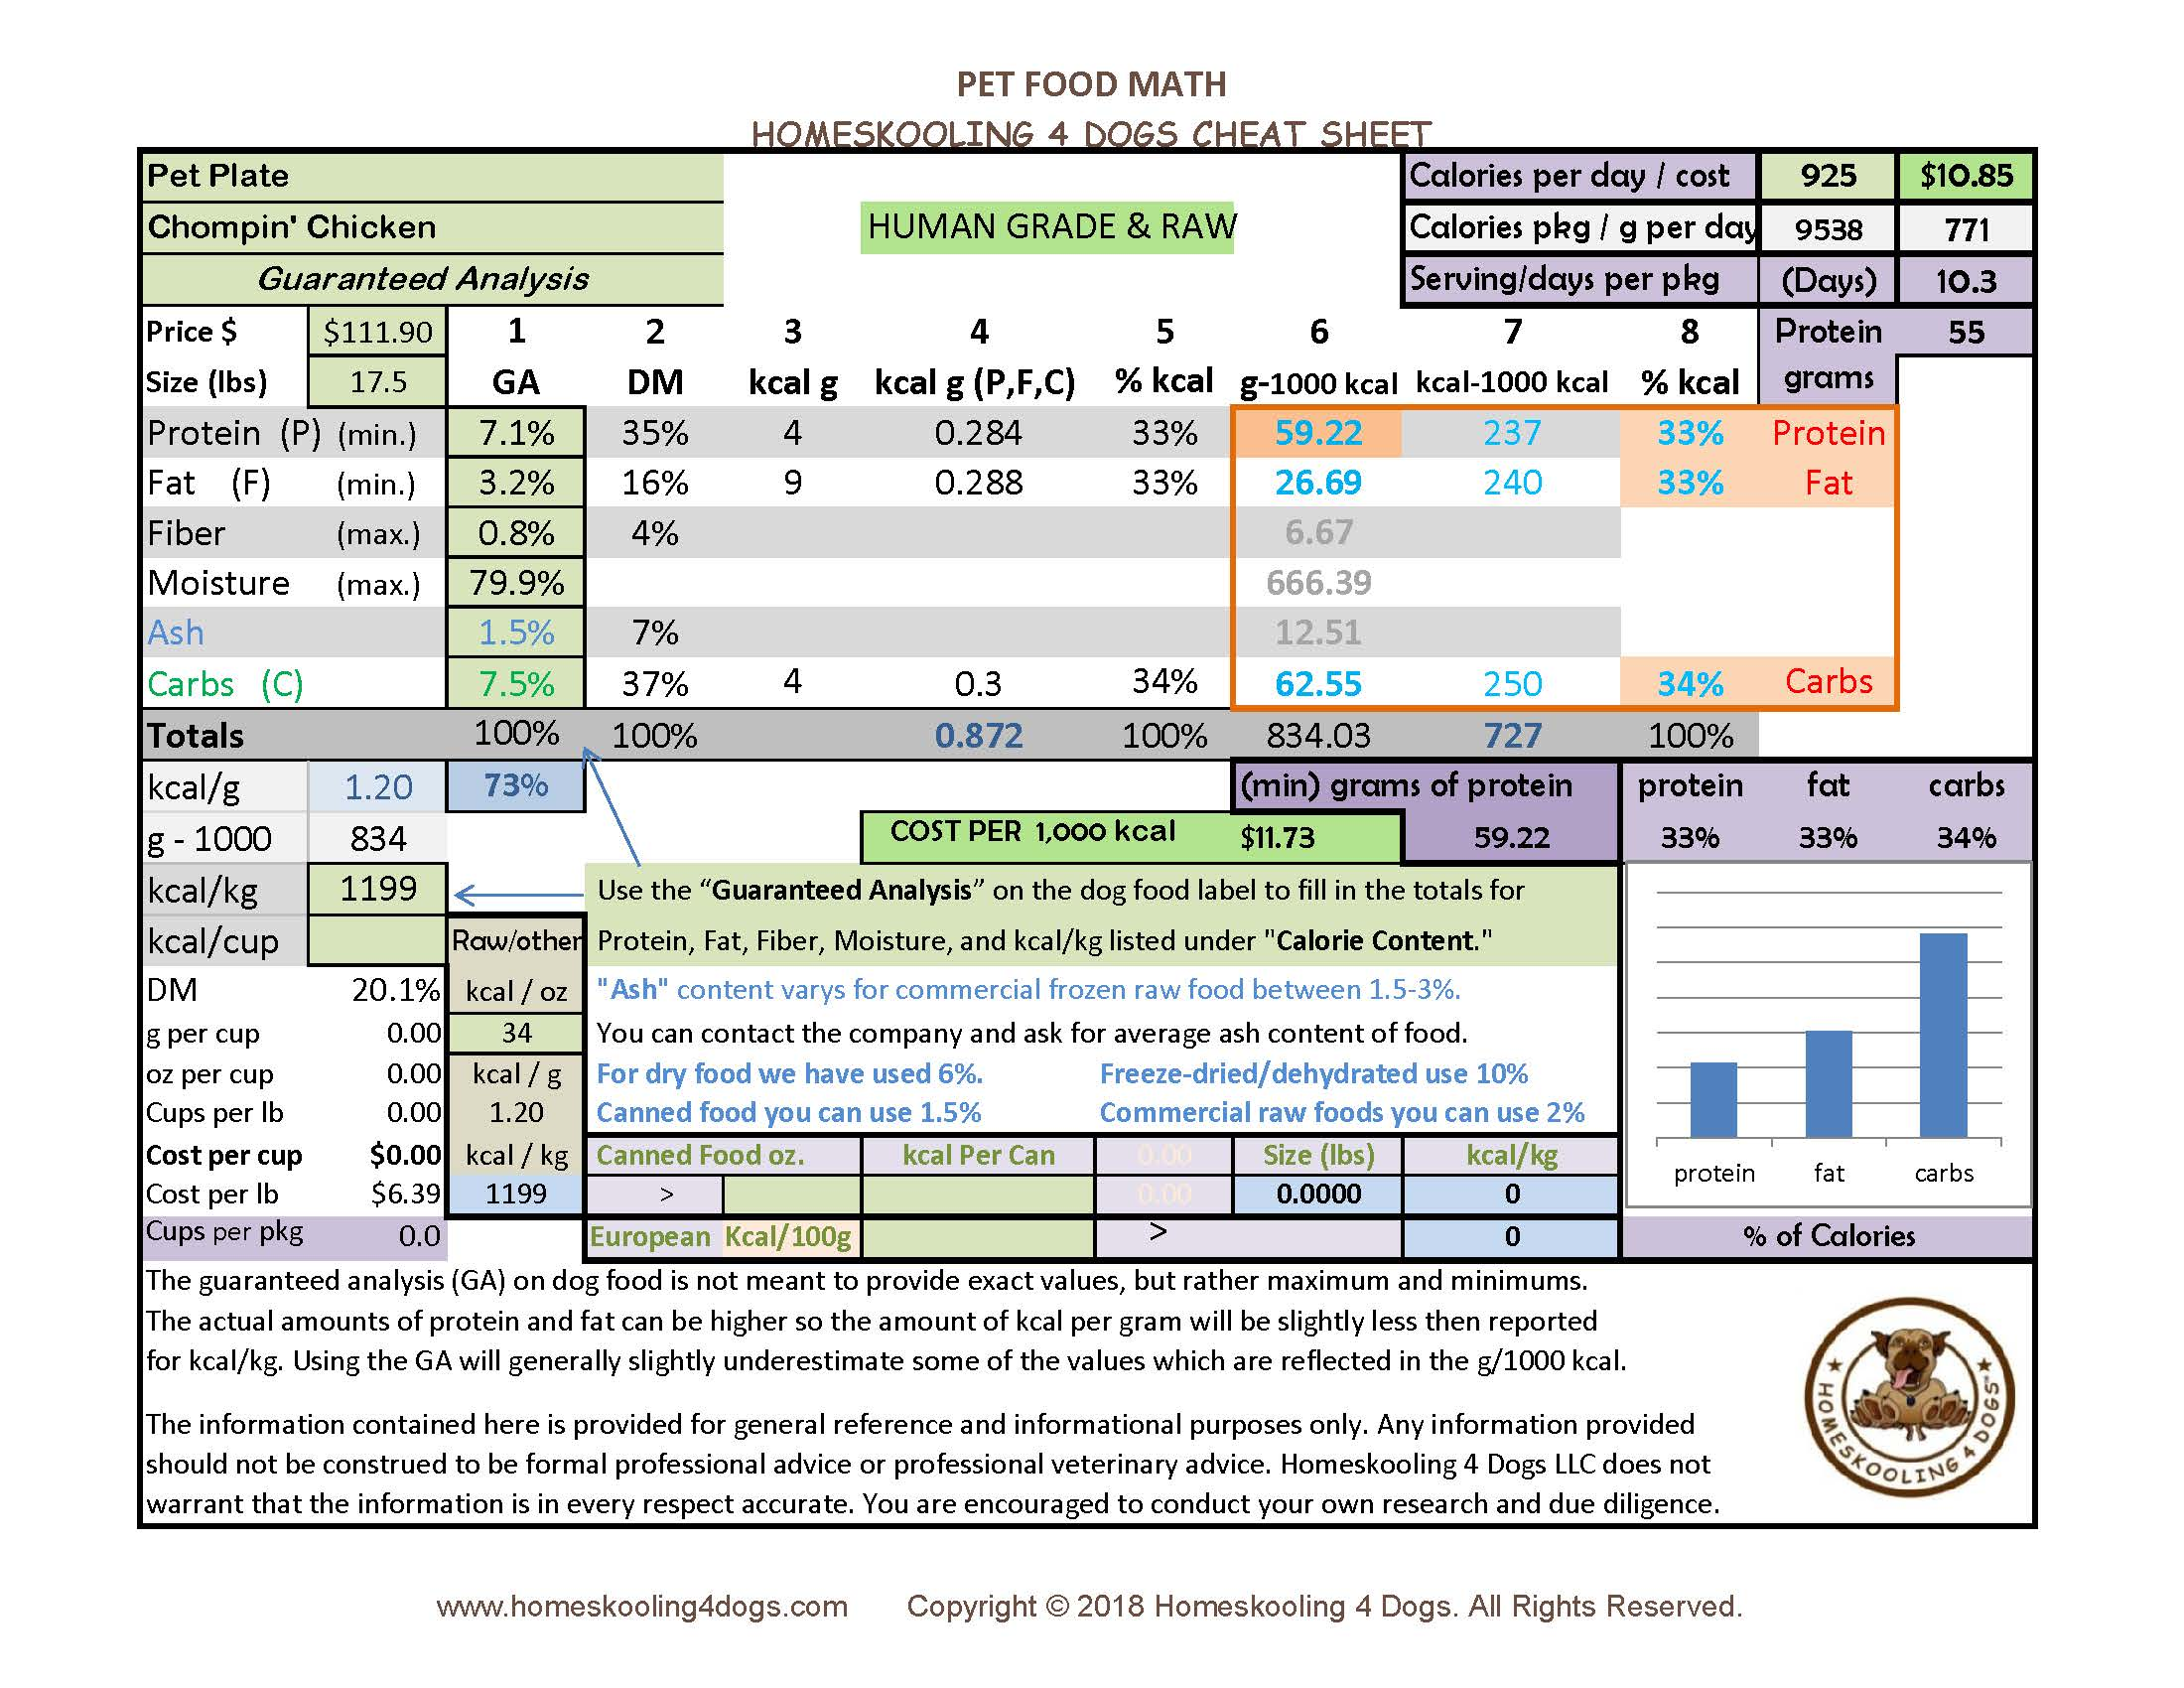 PET PLATE - Guaranteed Analysis